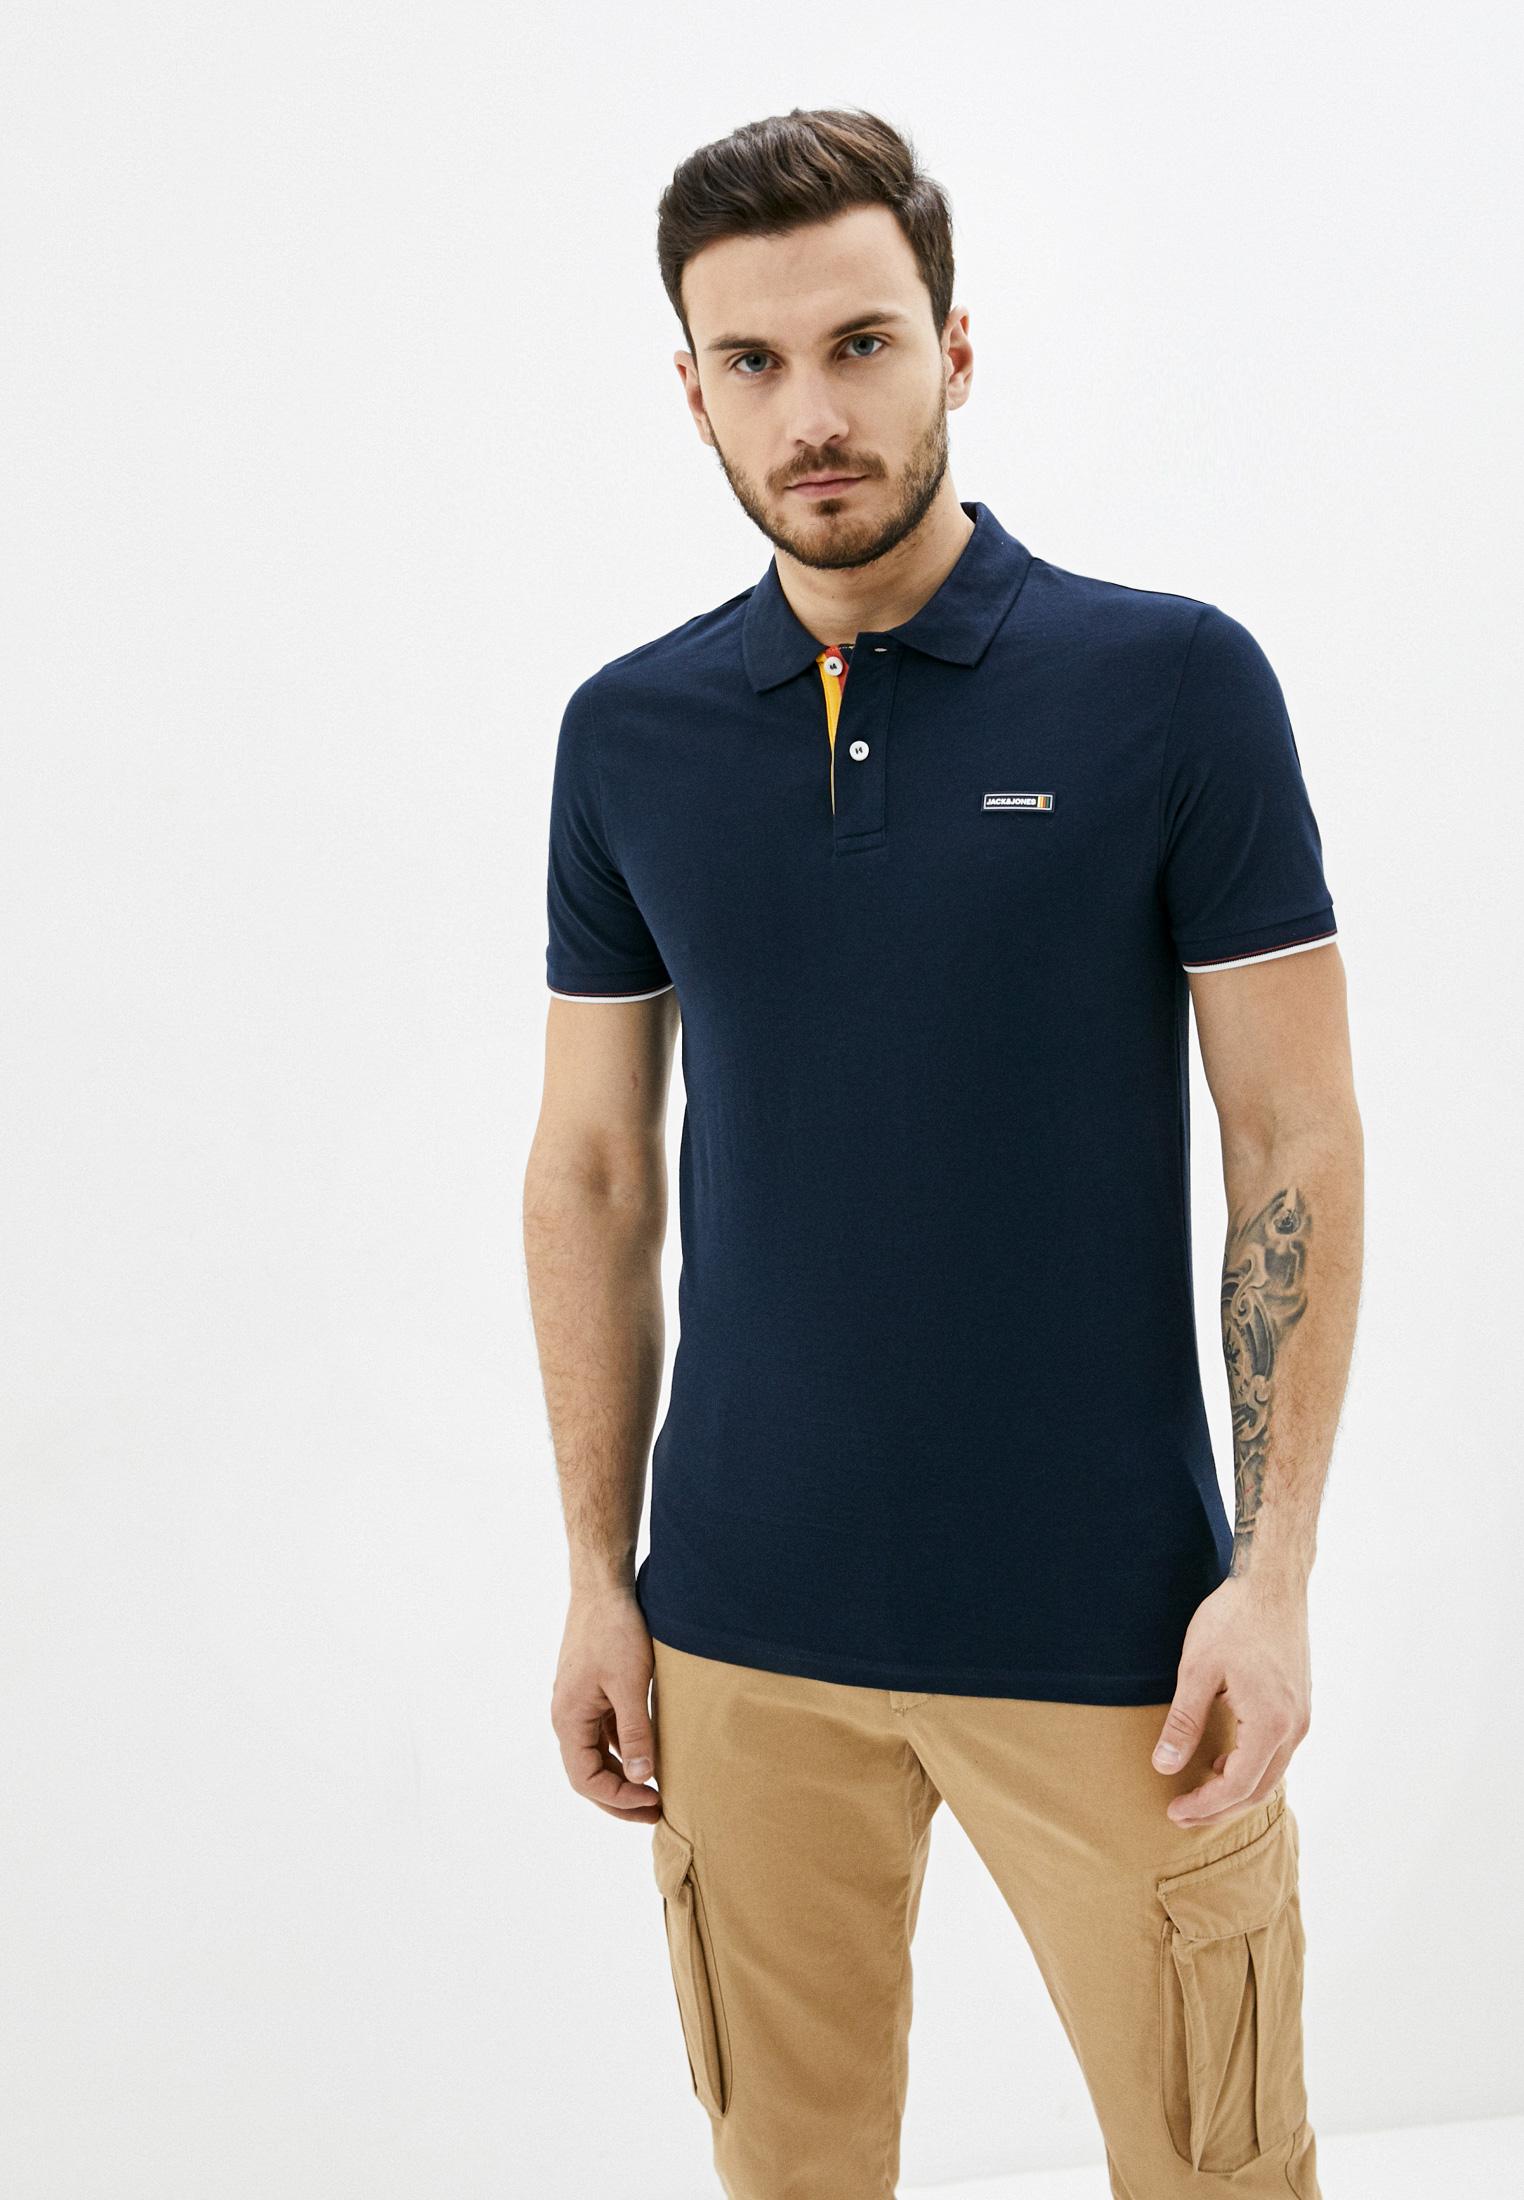 картинки мужские футболки и поло того